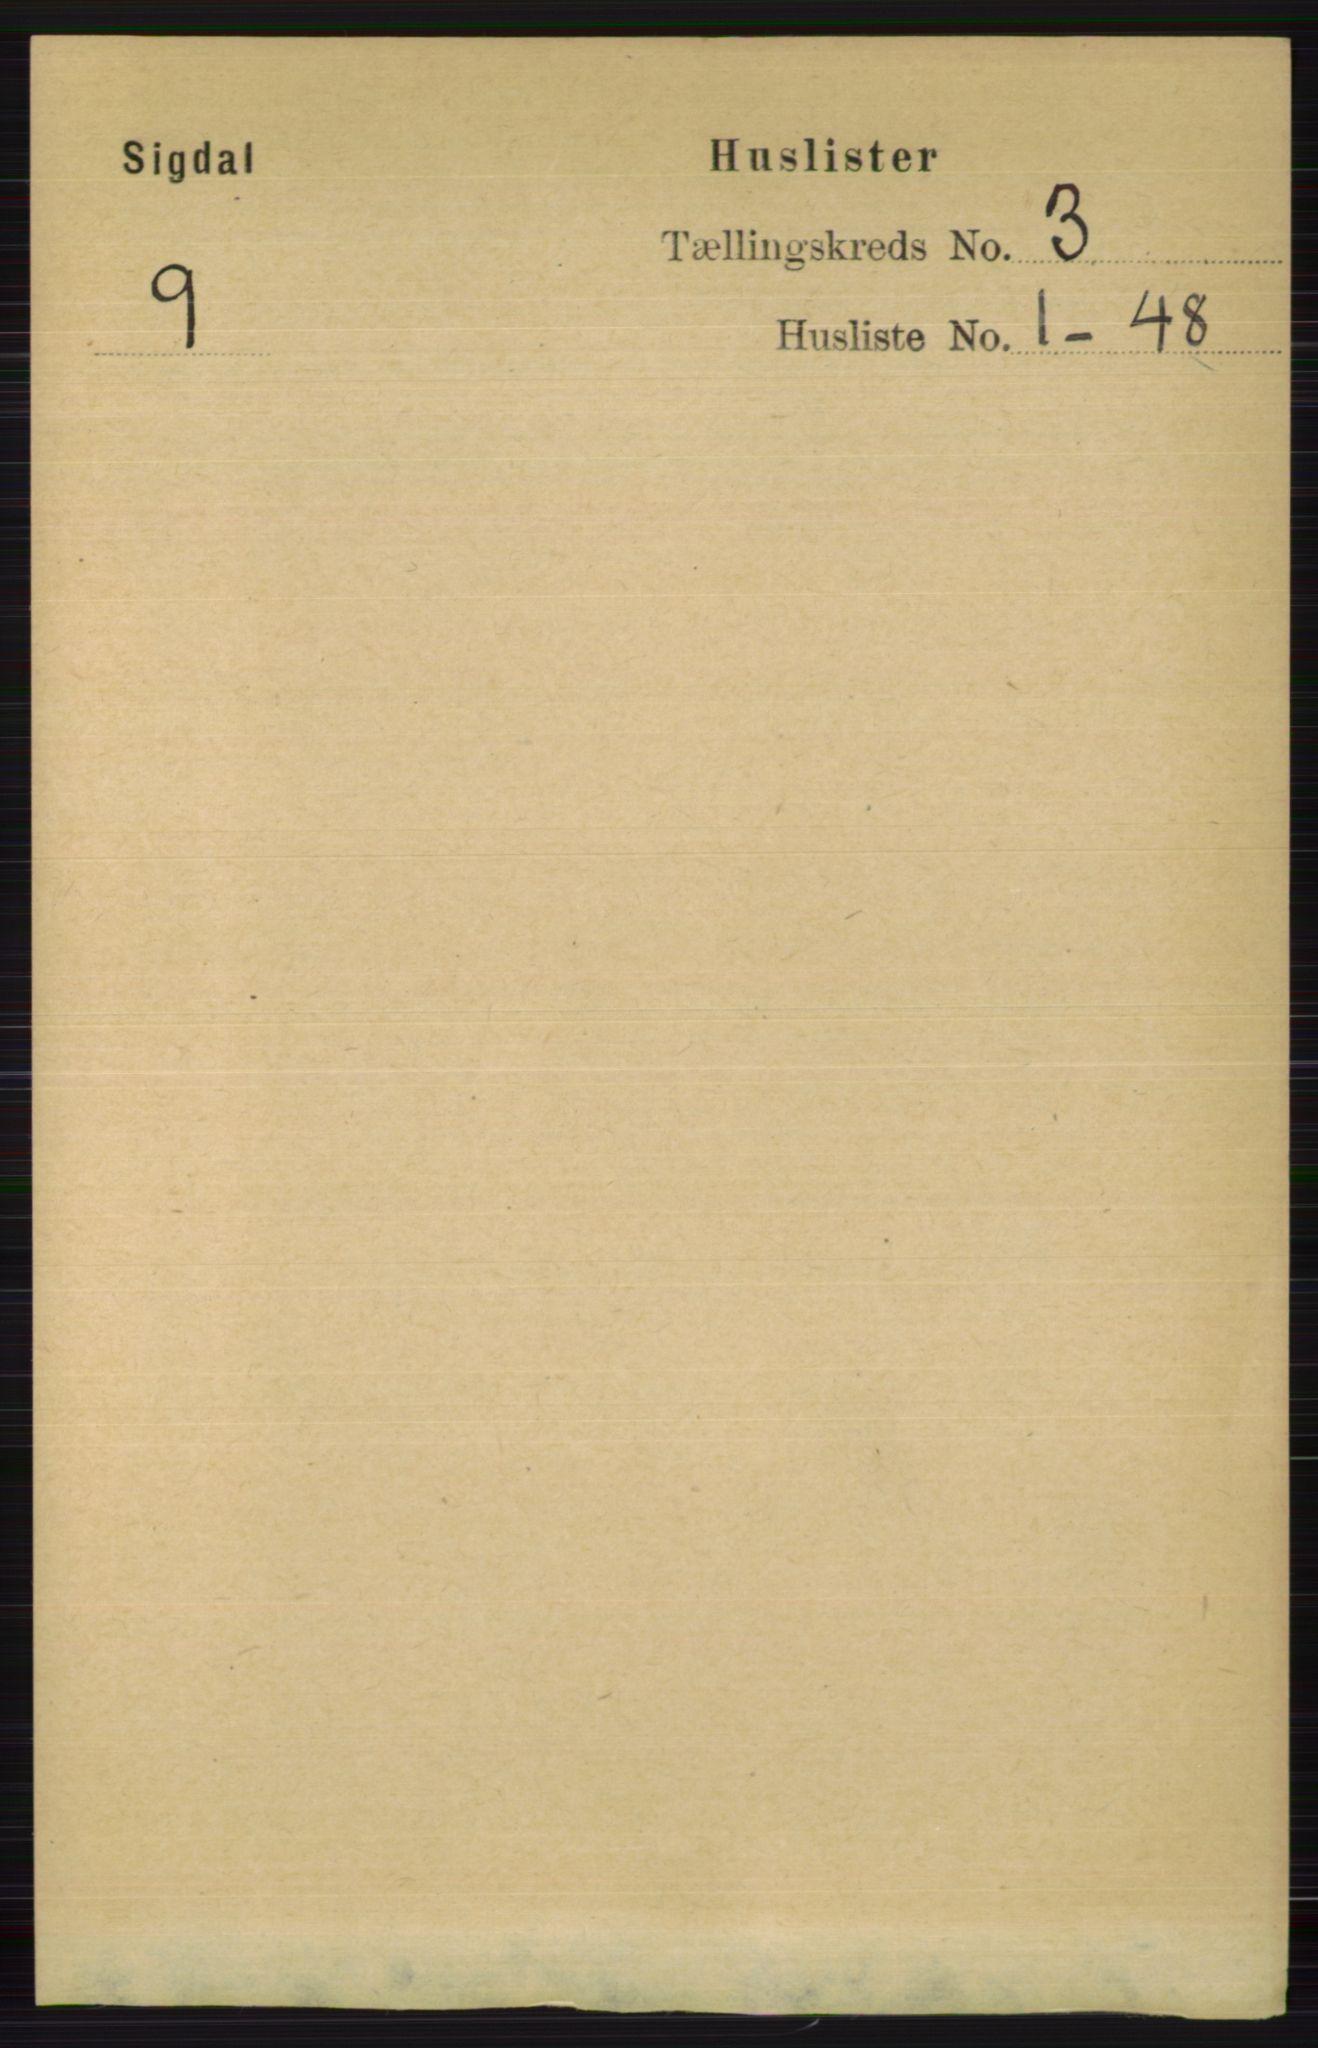 RA, Folketelling 1891 for 0621 Sigdal herred, 1891, s. 1280